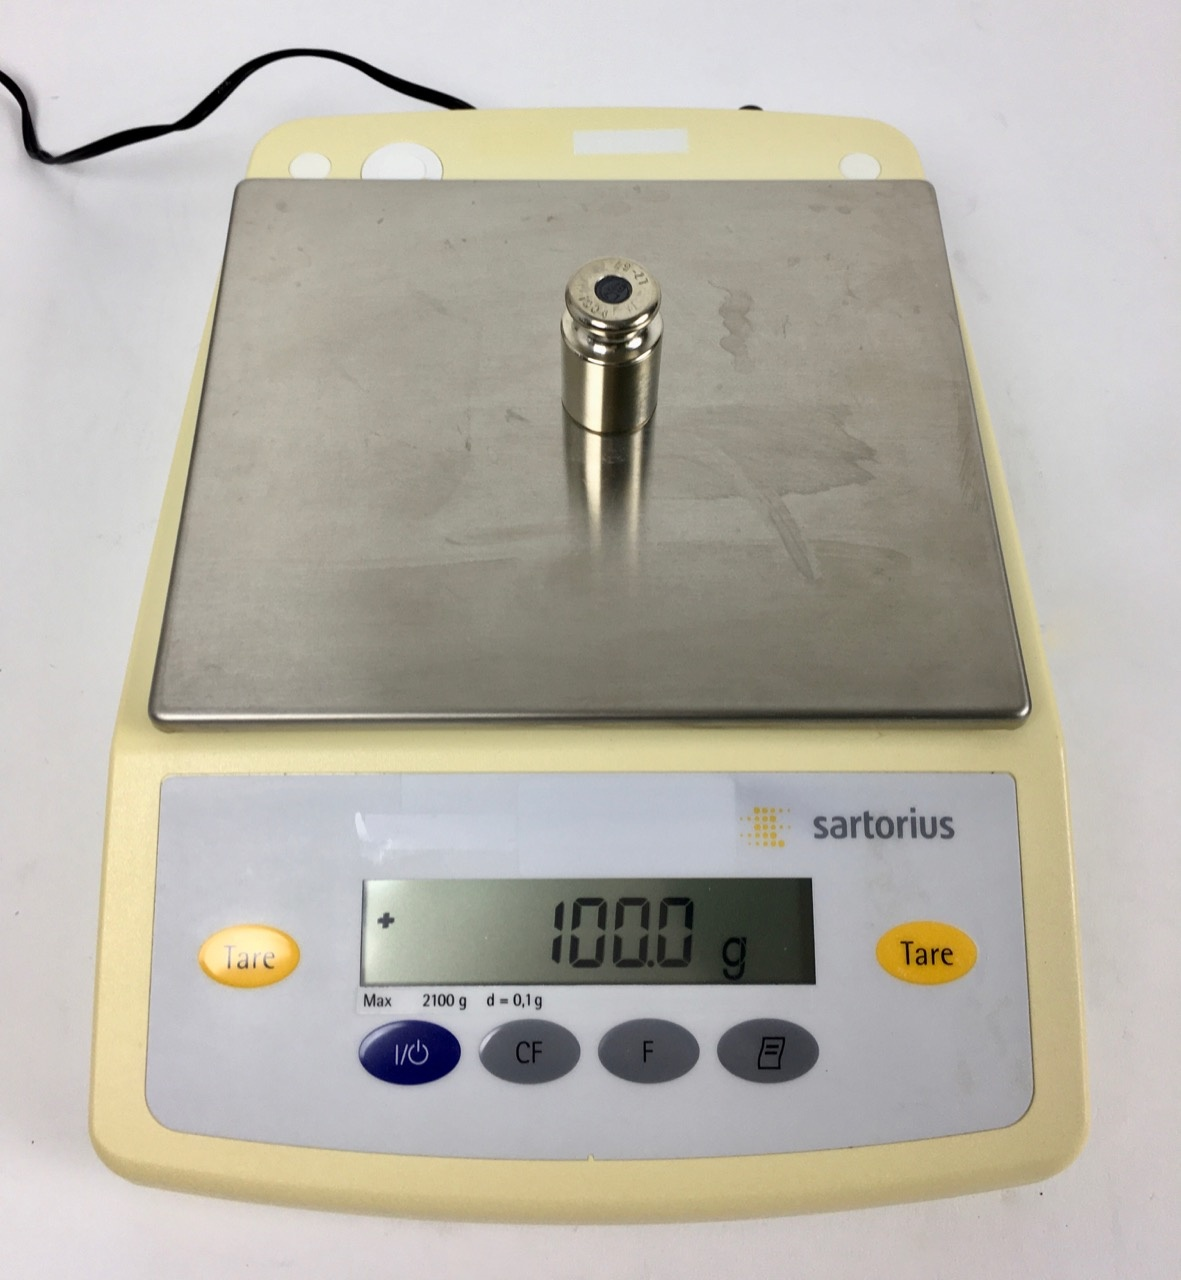 Sartorius Sartorius TE2101 Präzisionswaage (max. 2100 g/ Auflösung 0,1g)